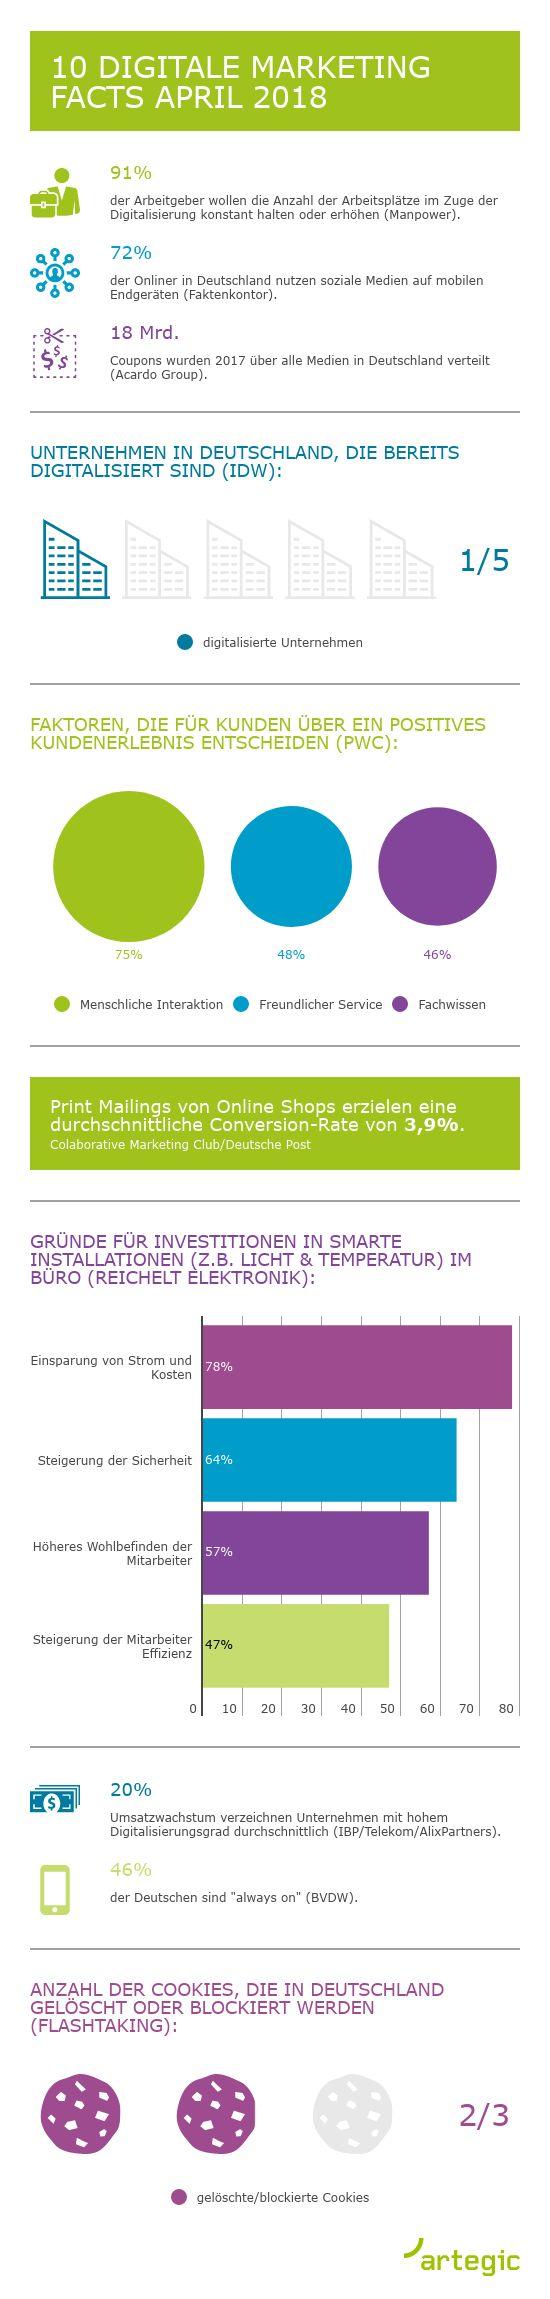 Infografik: 10 digitale Marketing KPI April 2018